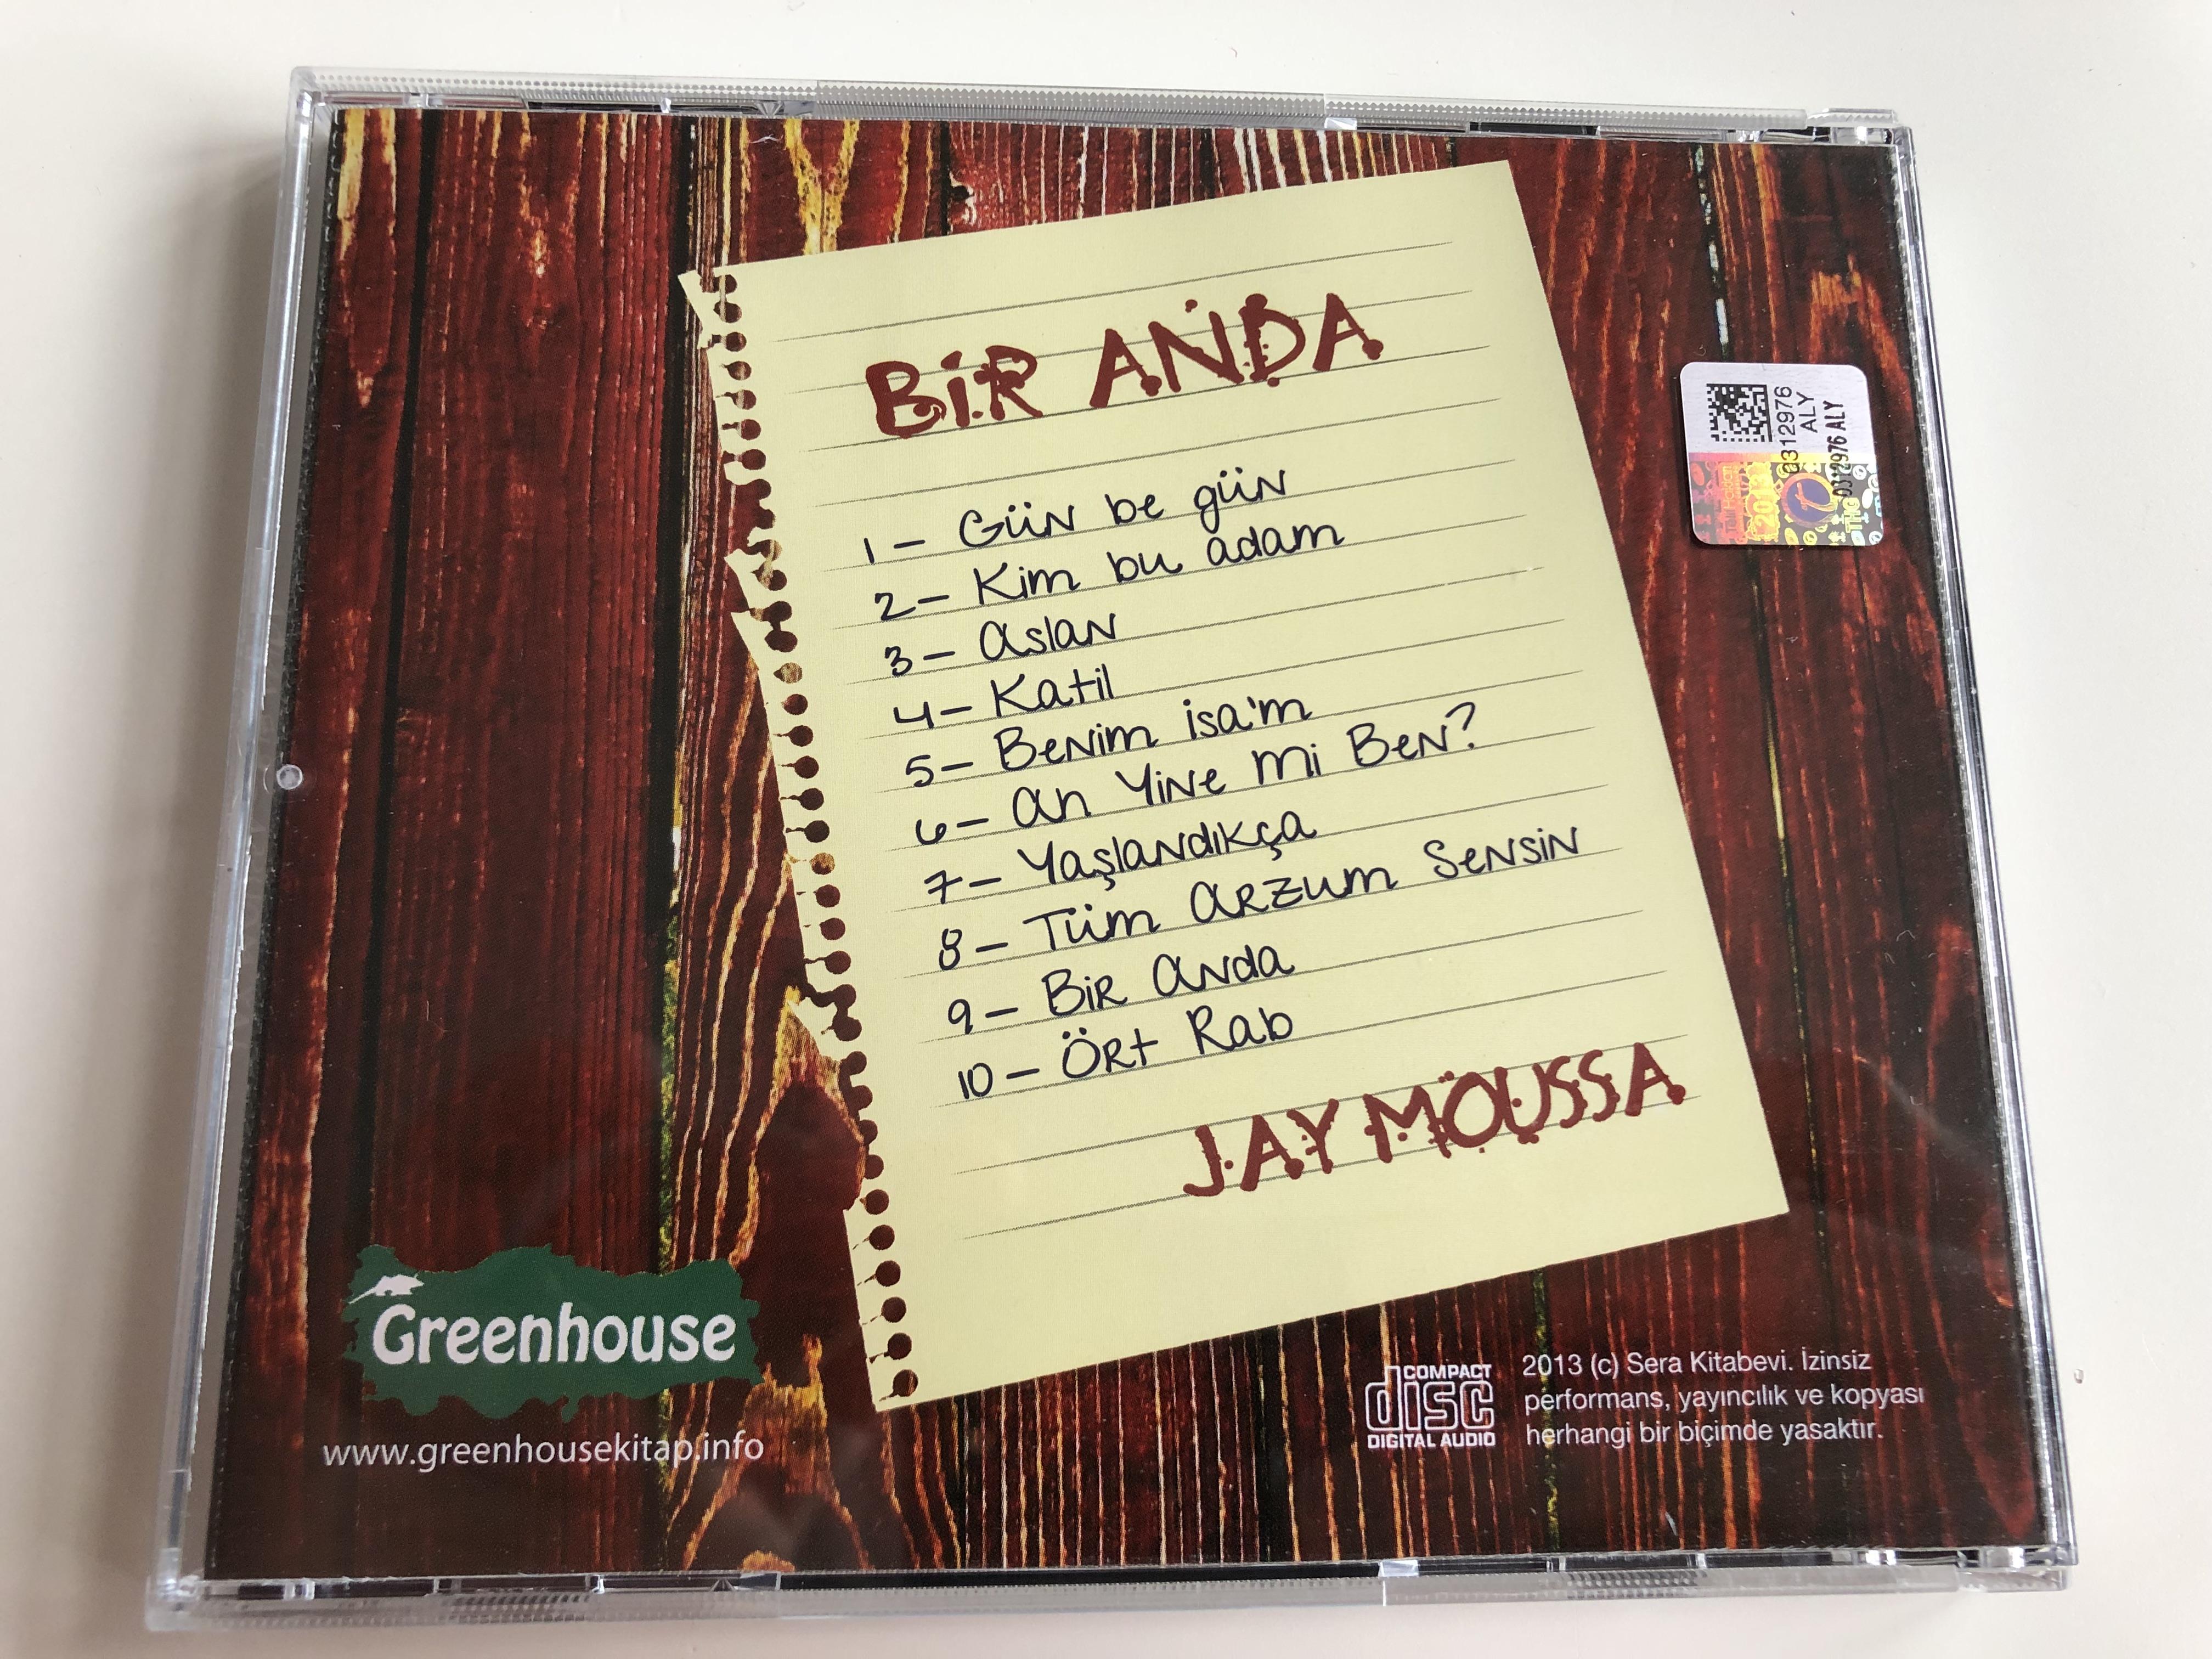 bir-anda-jay-moussa-turkish-cd-2013-suddenly-7-.jpg